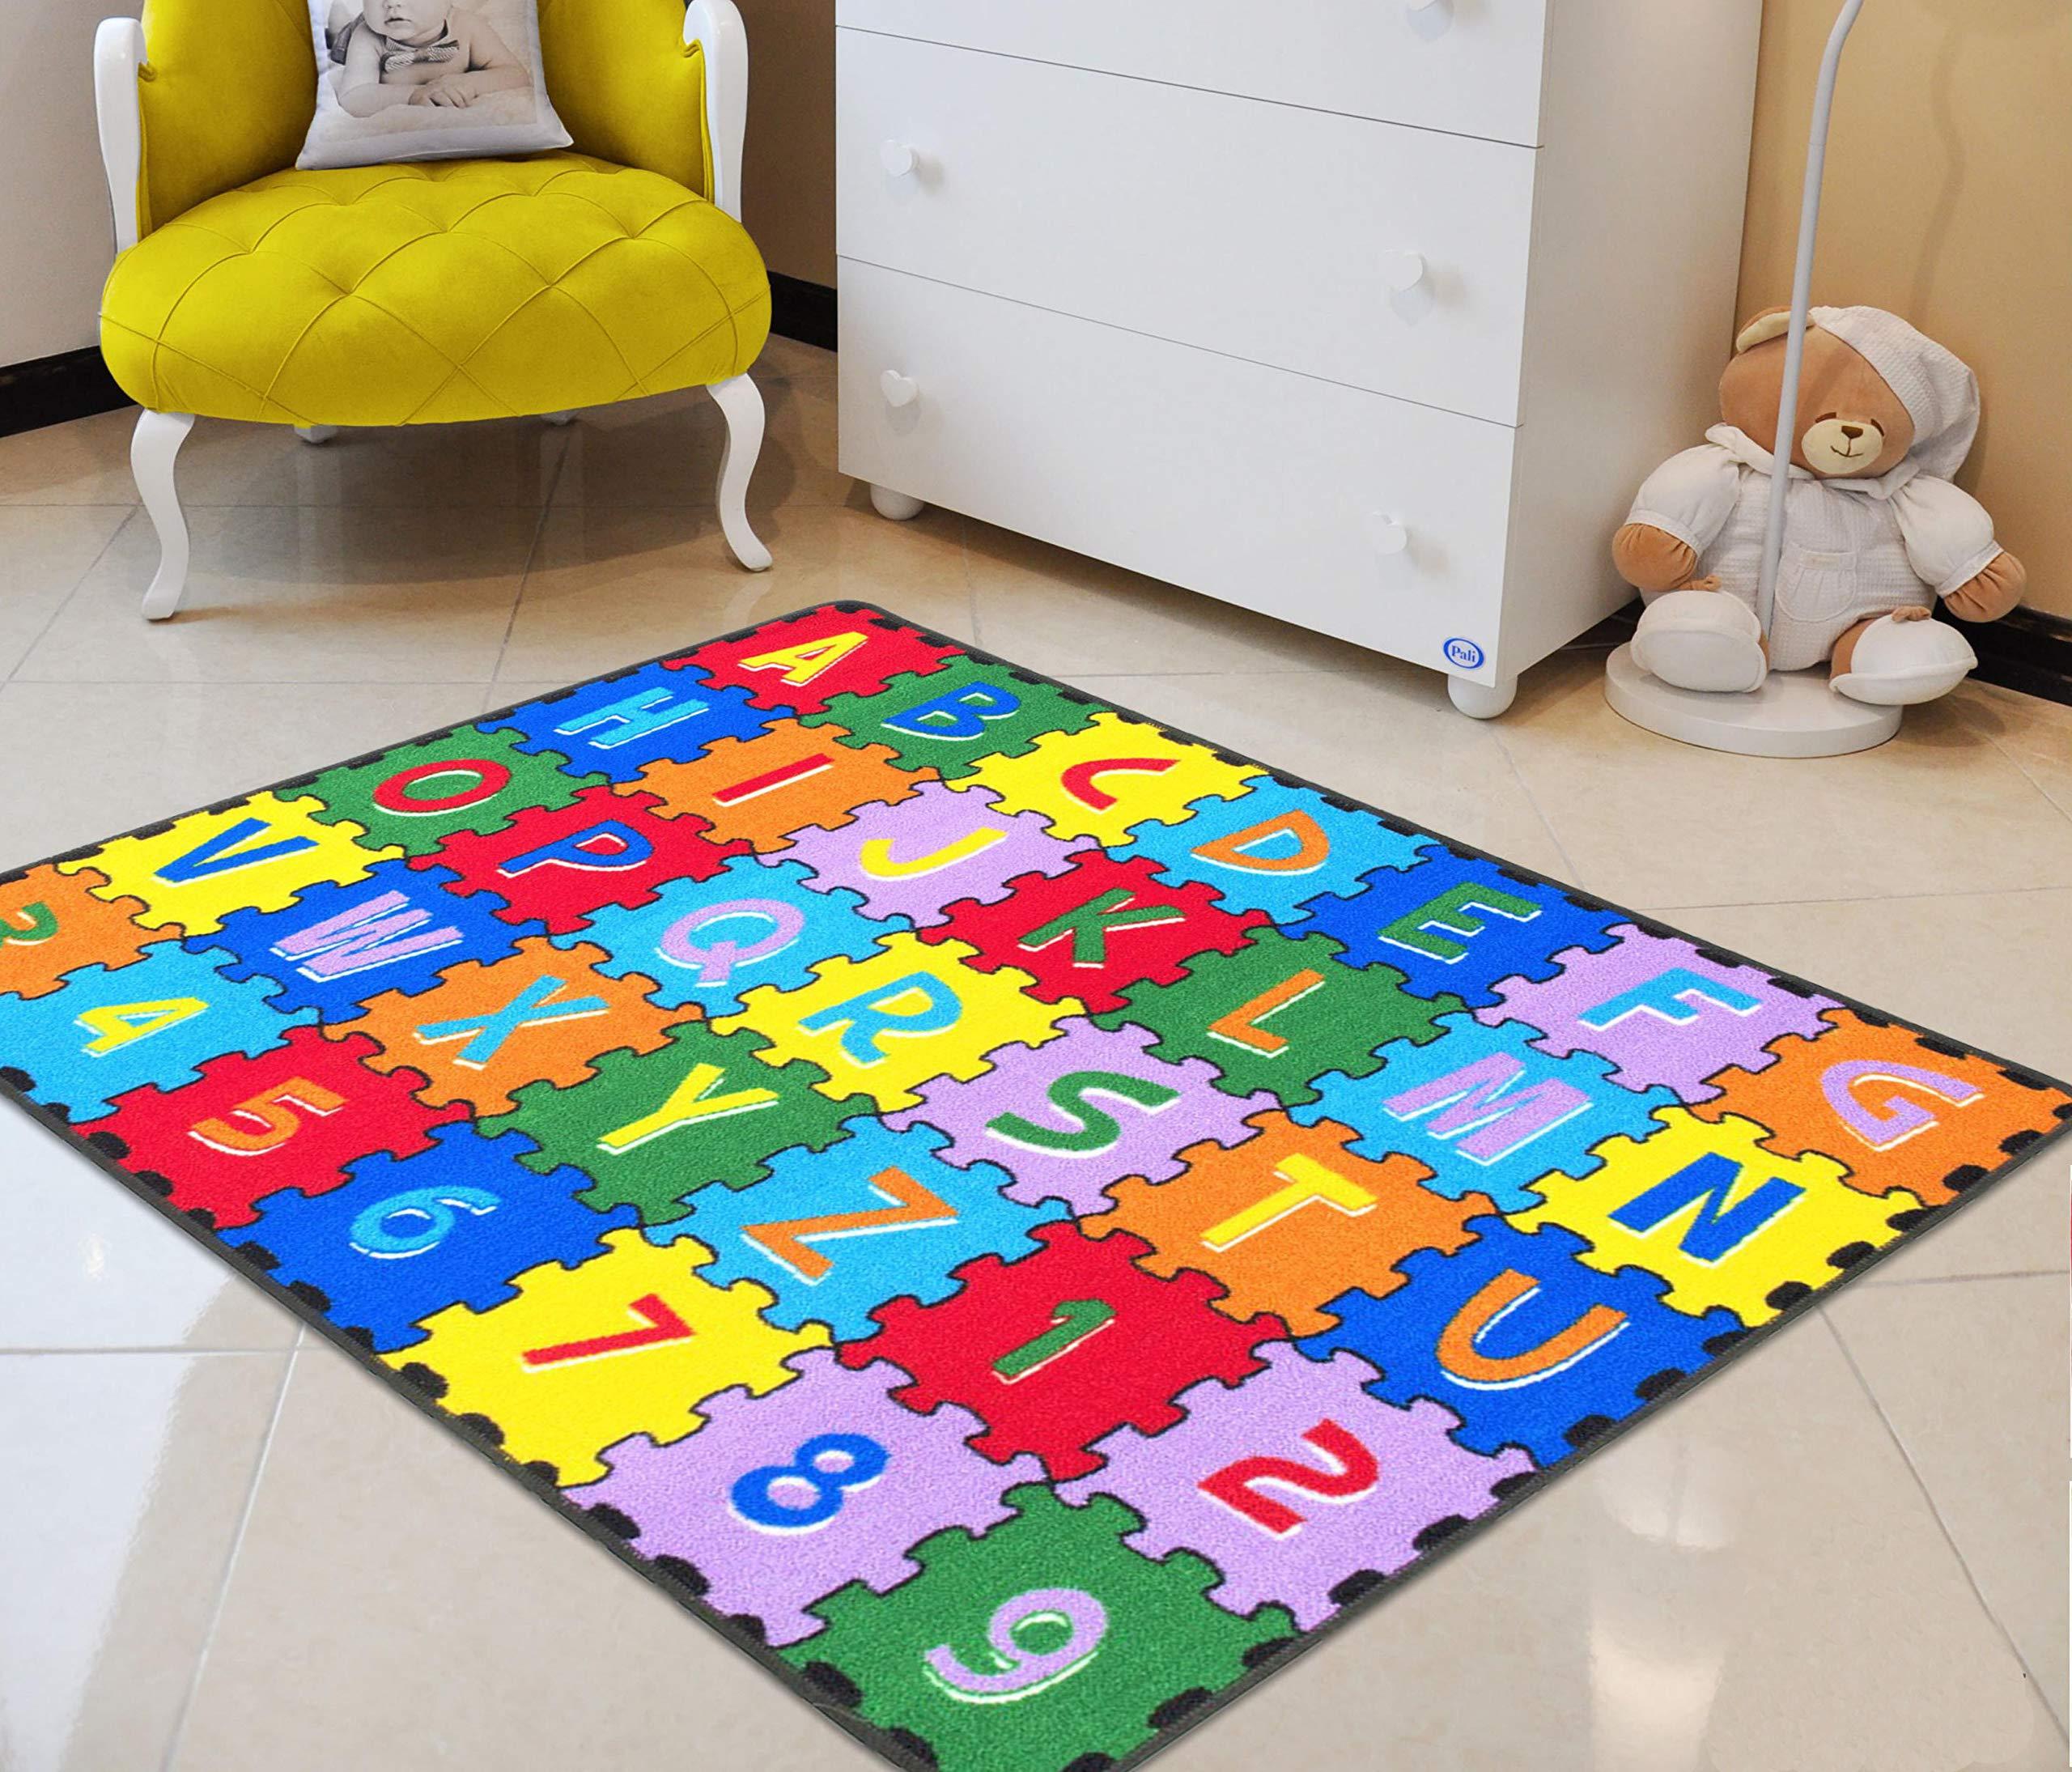 Alphabet/ABC Puzzle Letters/Numbers Kids Accent Kids/Boys/Girls/Children/Toddler Educational Play mat for School/Daycare/Nursery Non-Slip Area Rug/Carpet-Teachers/Students Best Friend (Multi Color)